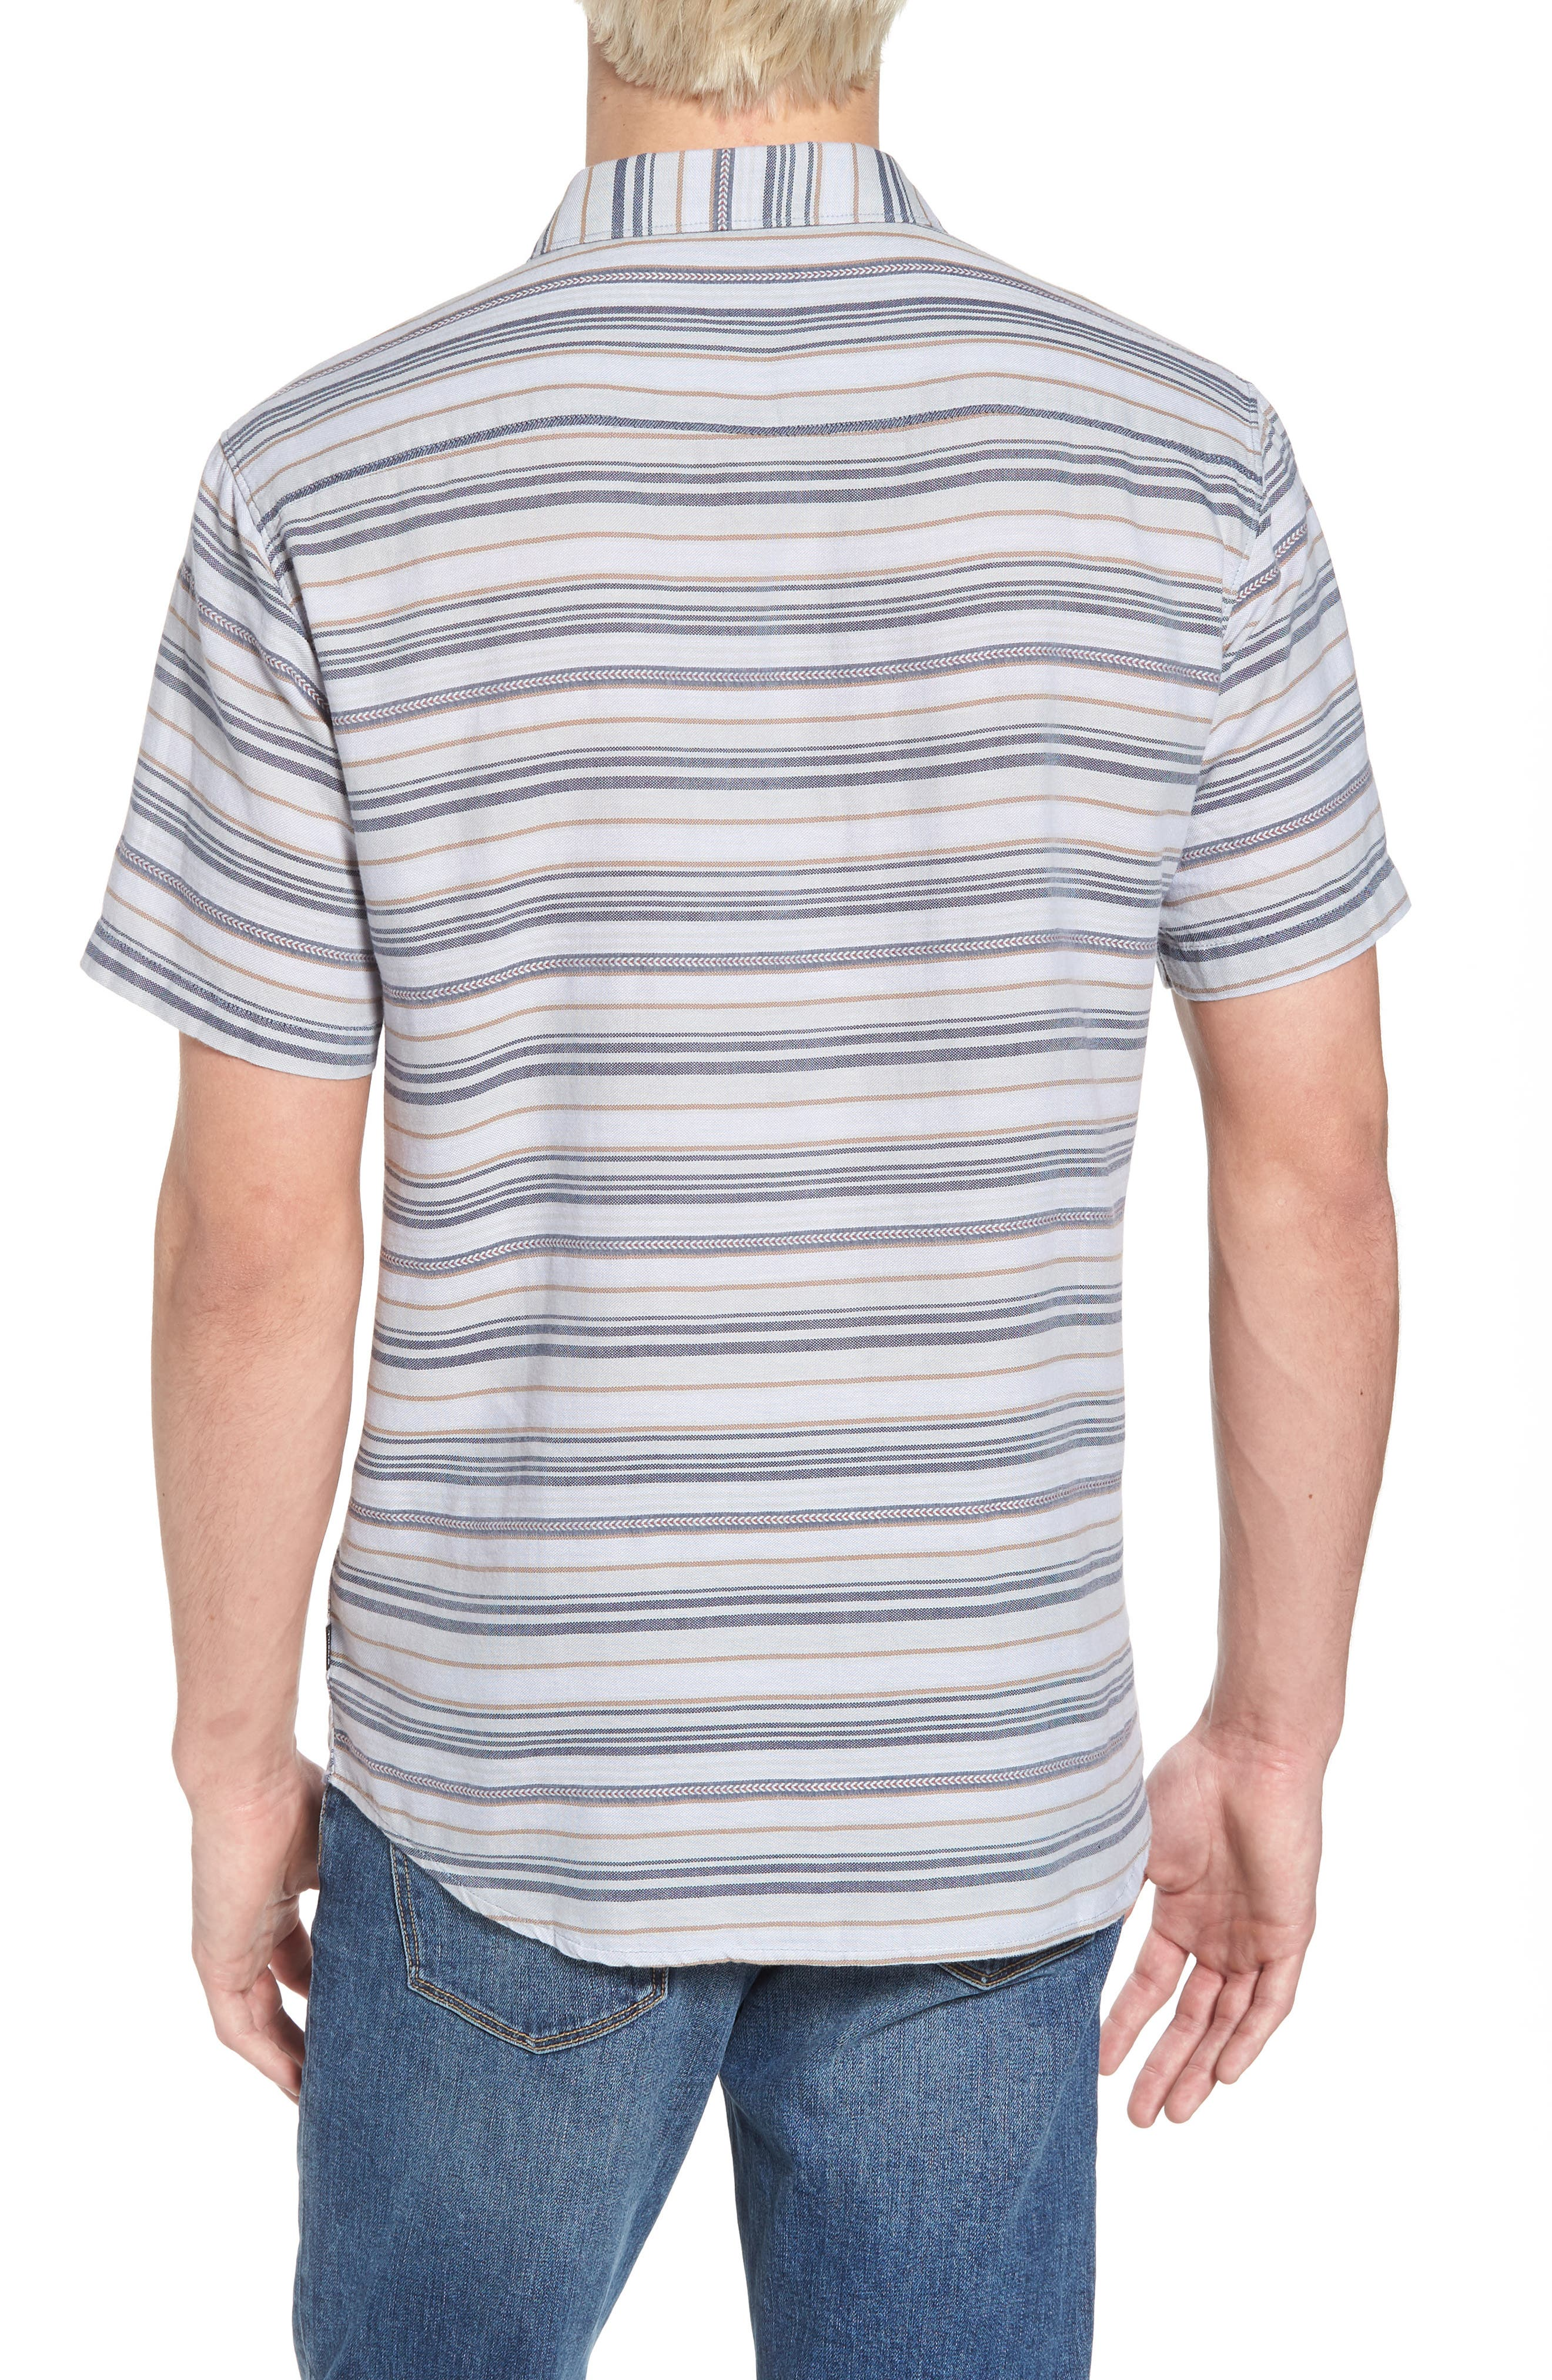 Currington Short Sleeve Shirt,                             Alternate thumbnail 4, color,